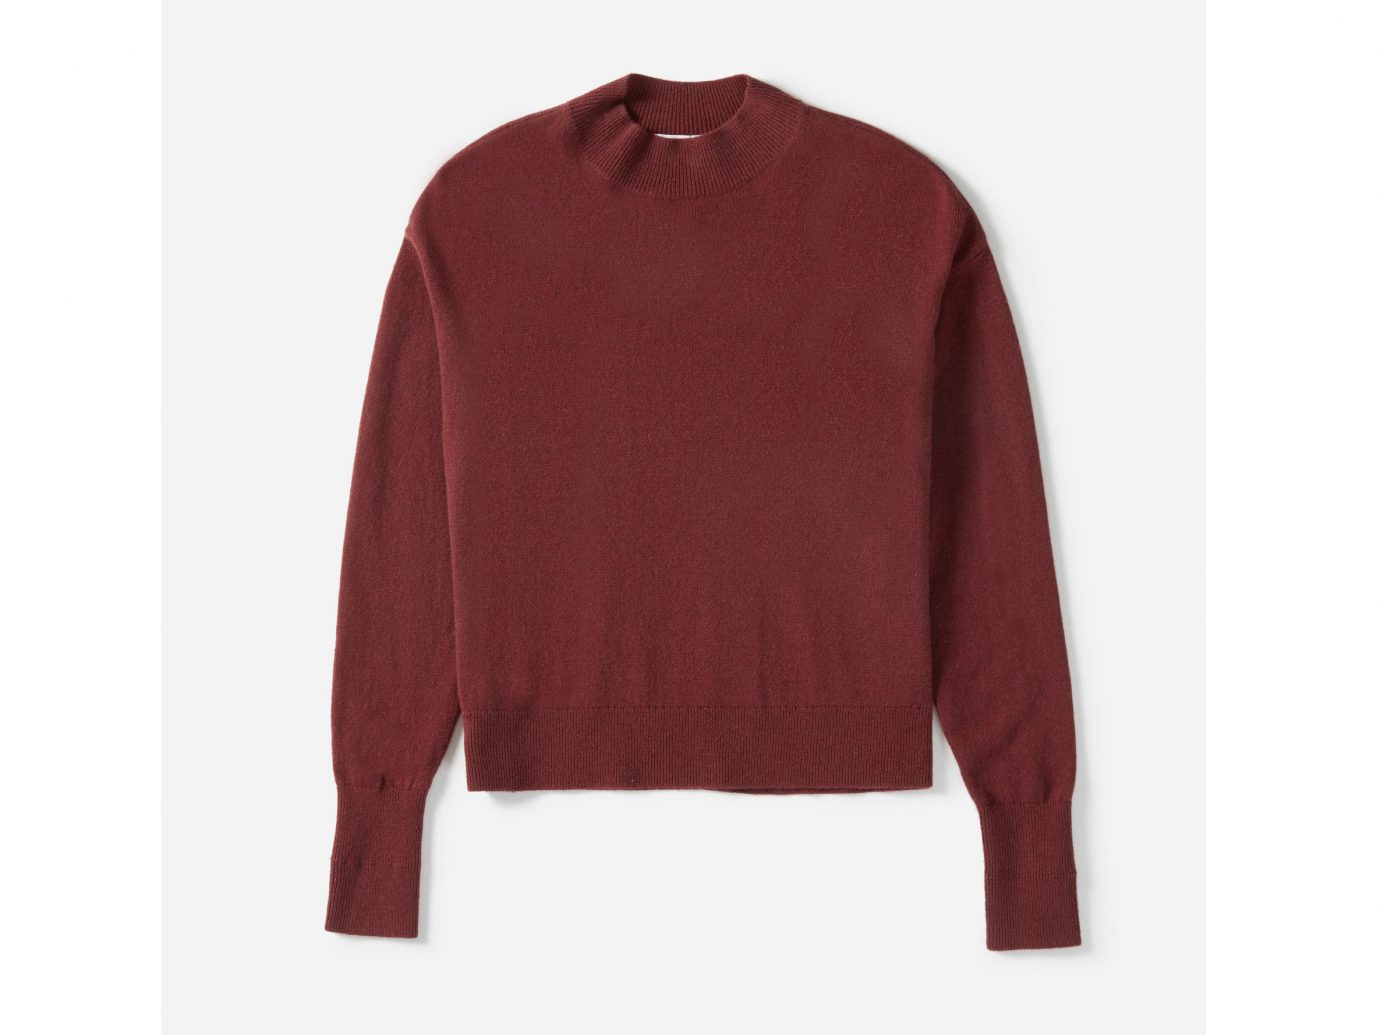 europe Hotels Prague clothing sleeve maroon sweater neck product long sleeved t shirt sweatshirt polar fleece woolen jacket